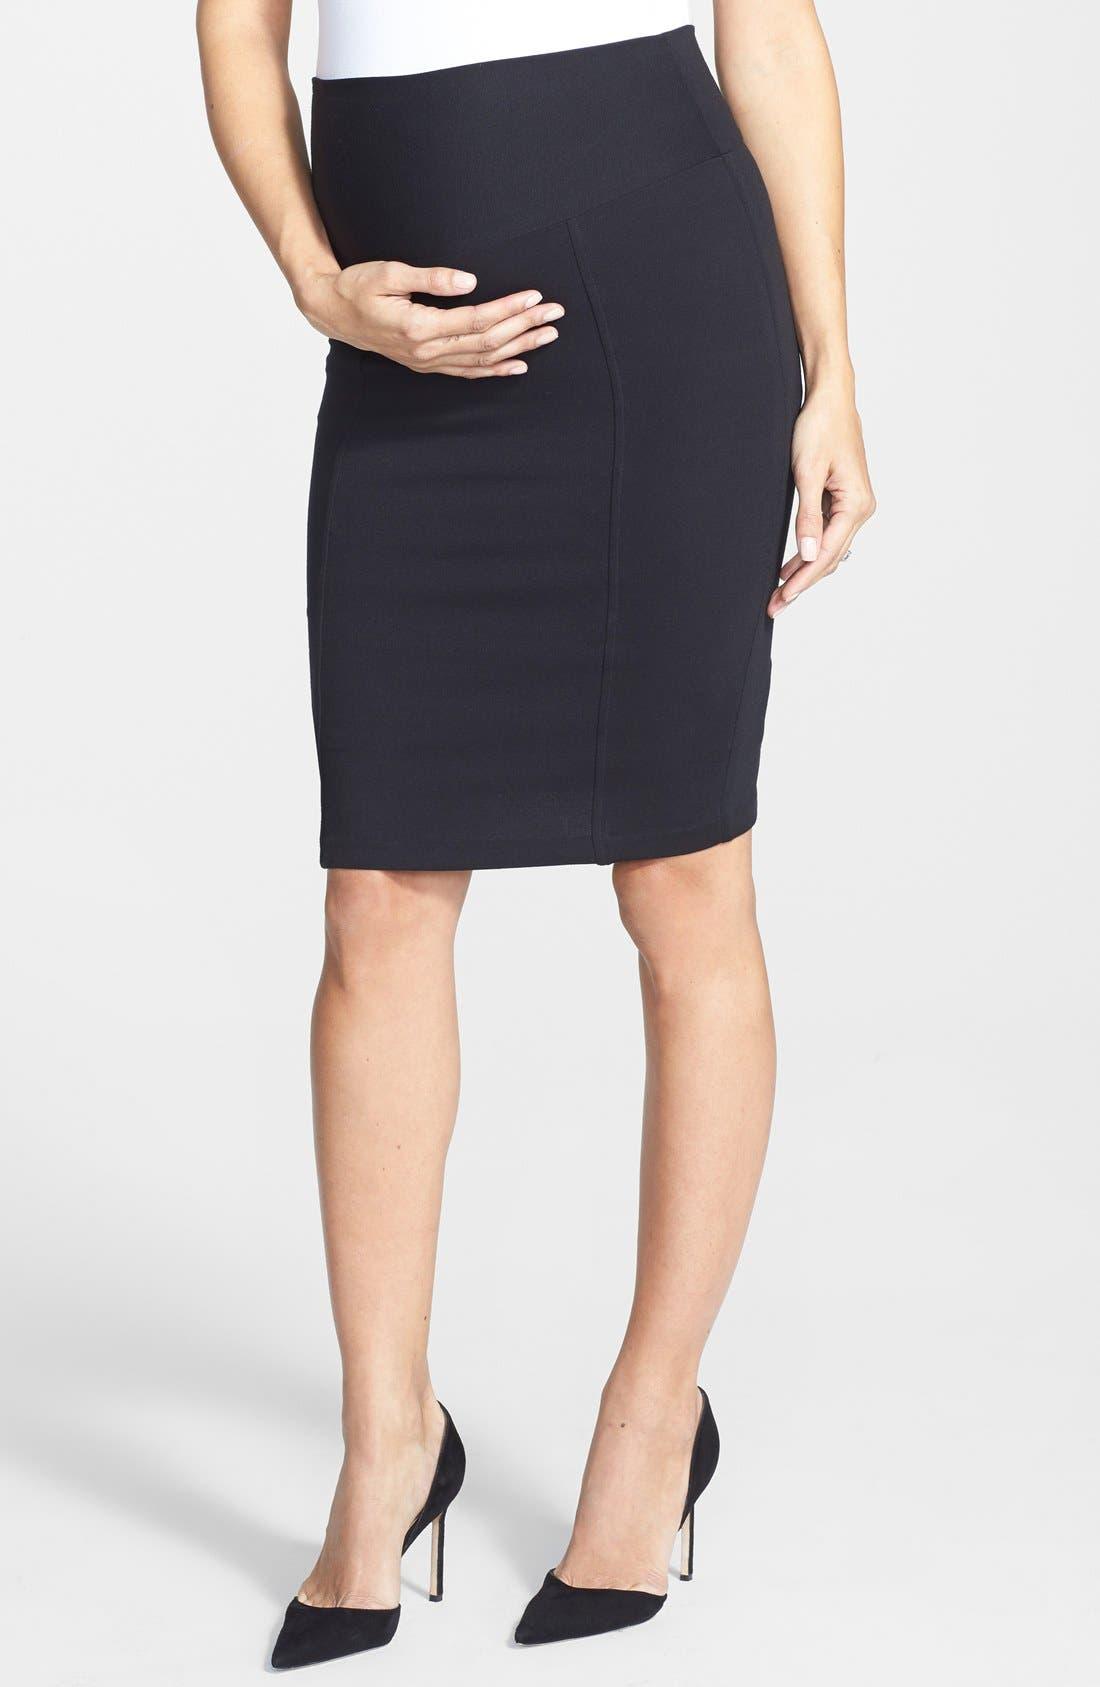 Alternate Image 1 Selected - Eva Alexander London Tailored Ponte Knit Maternity Pencil Skirt